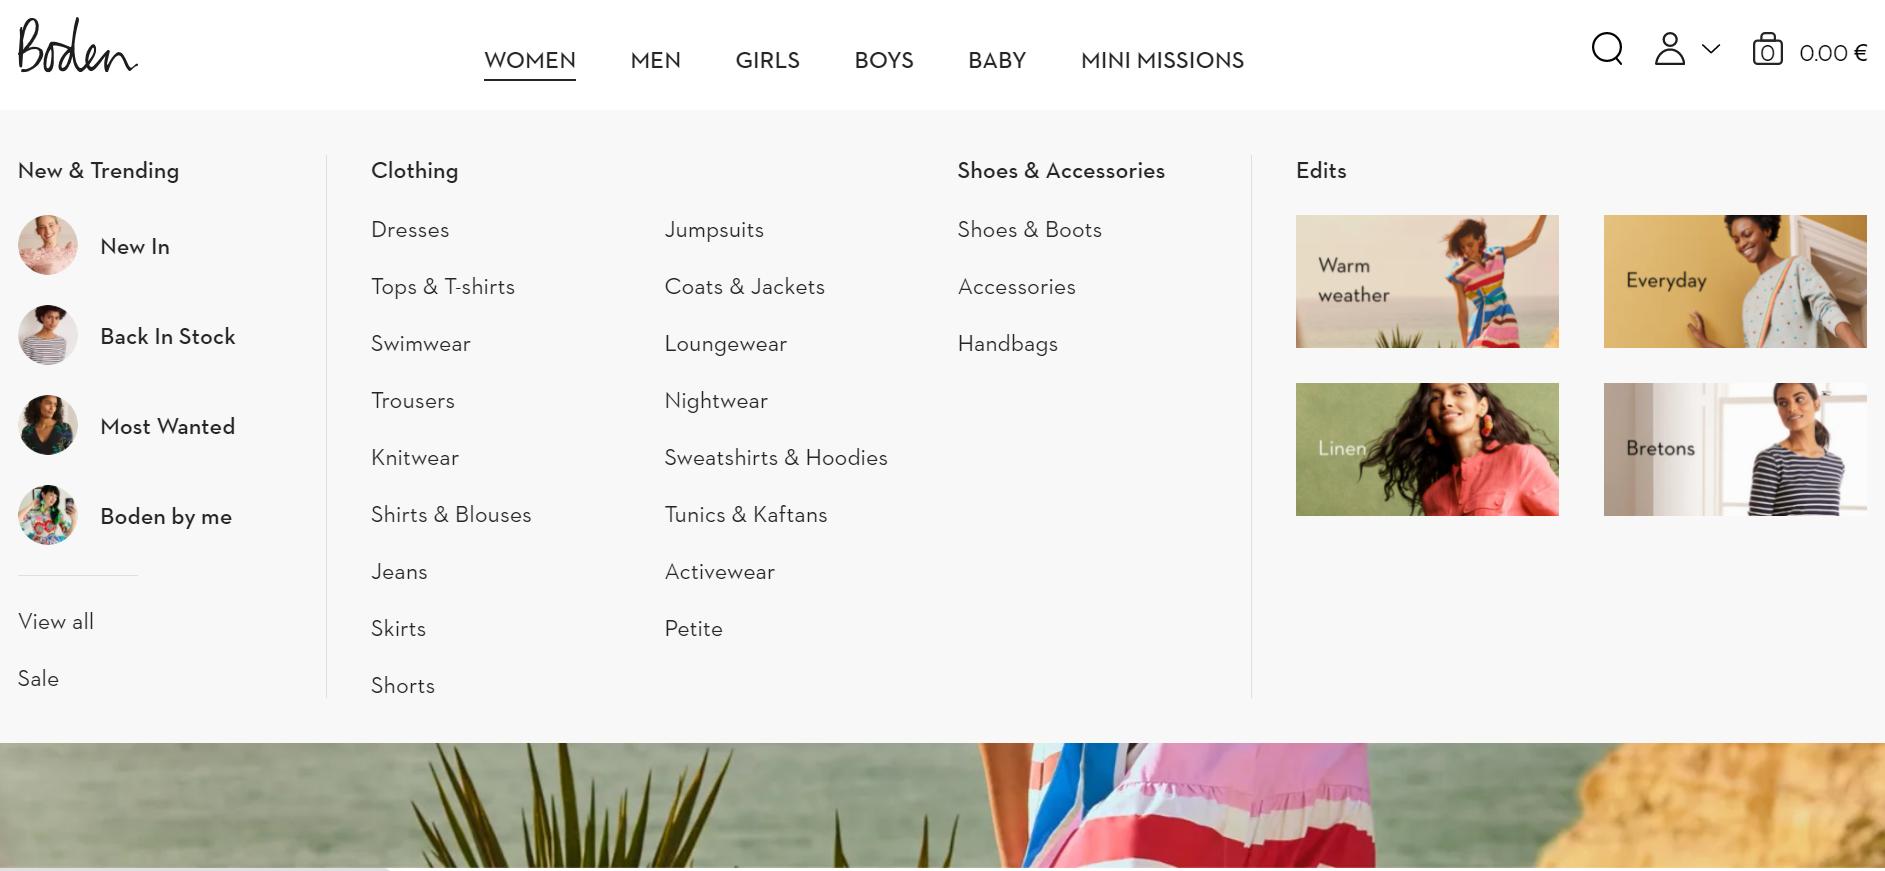 Boden Categories